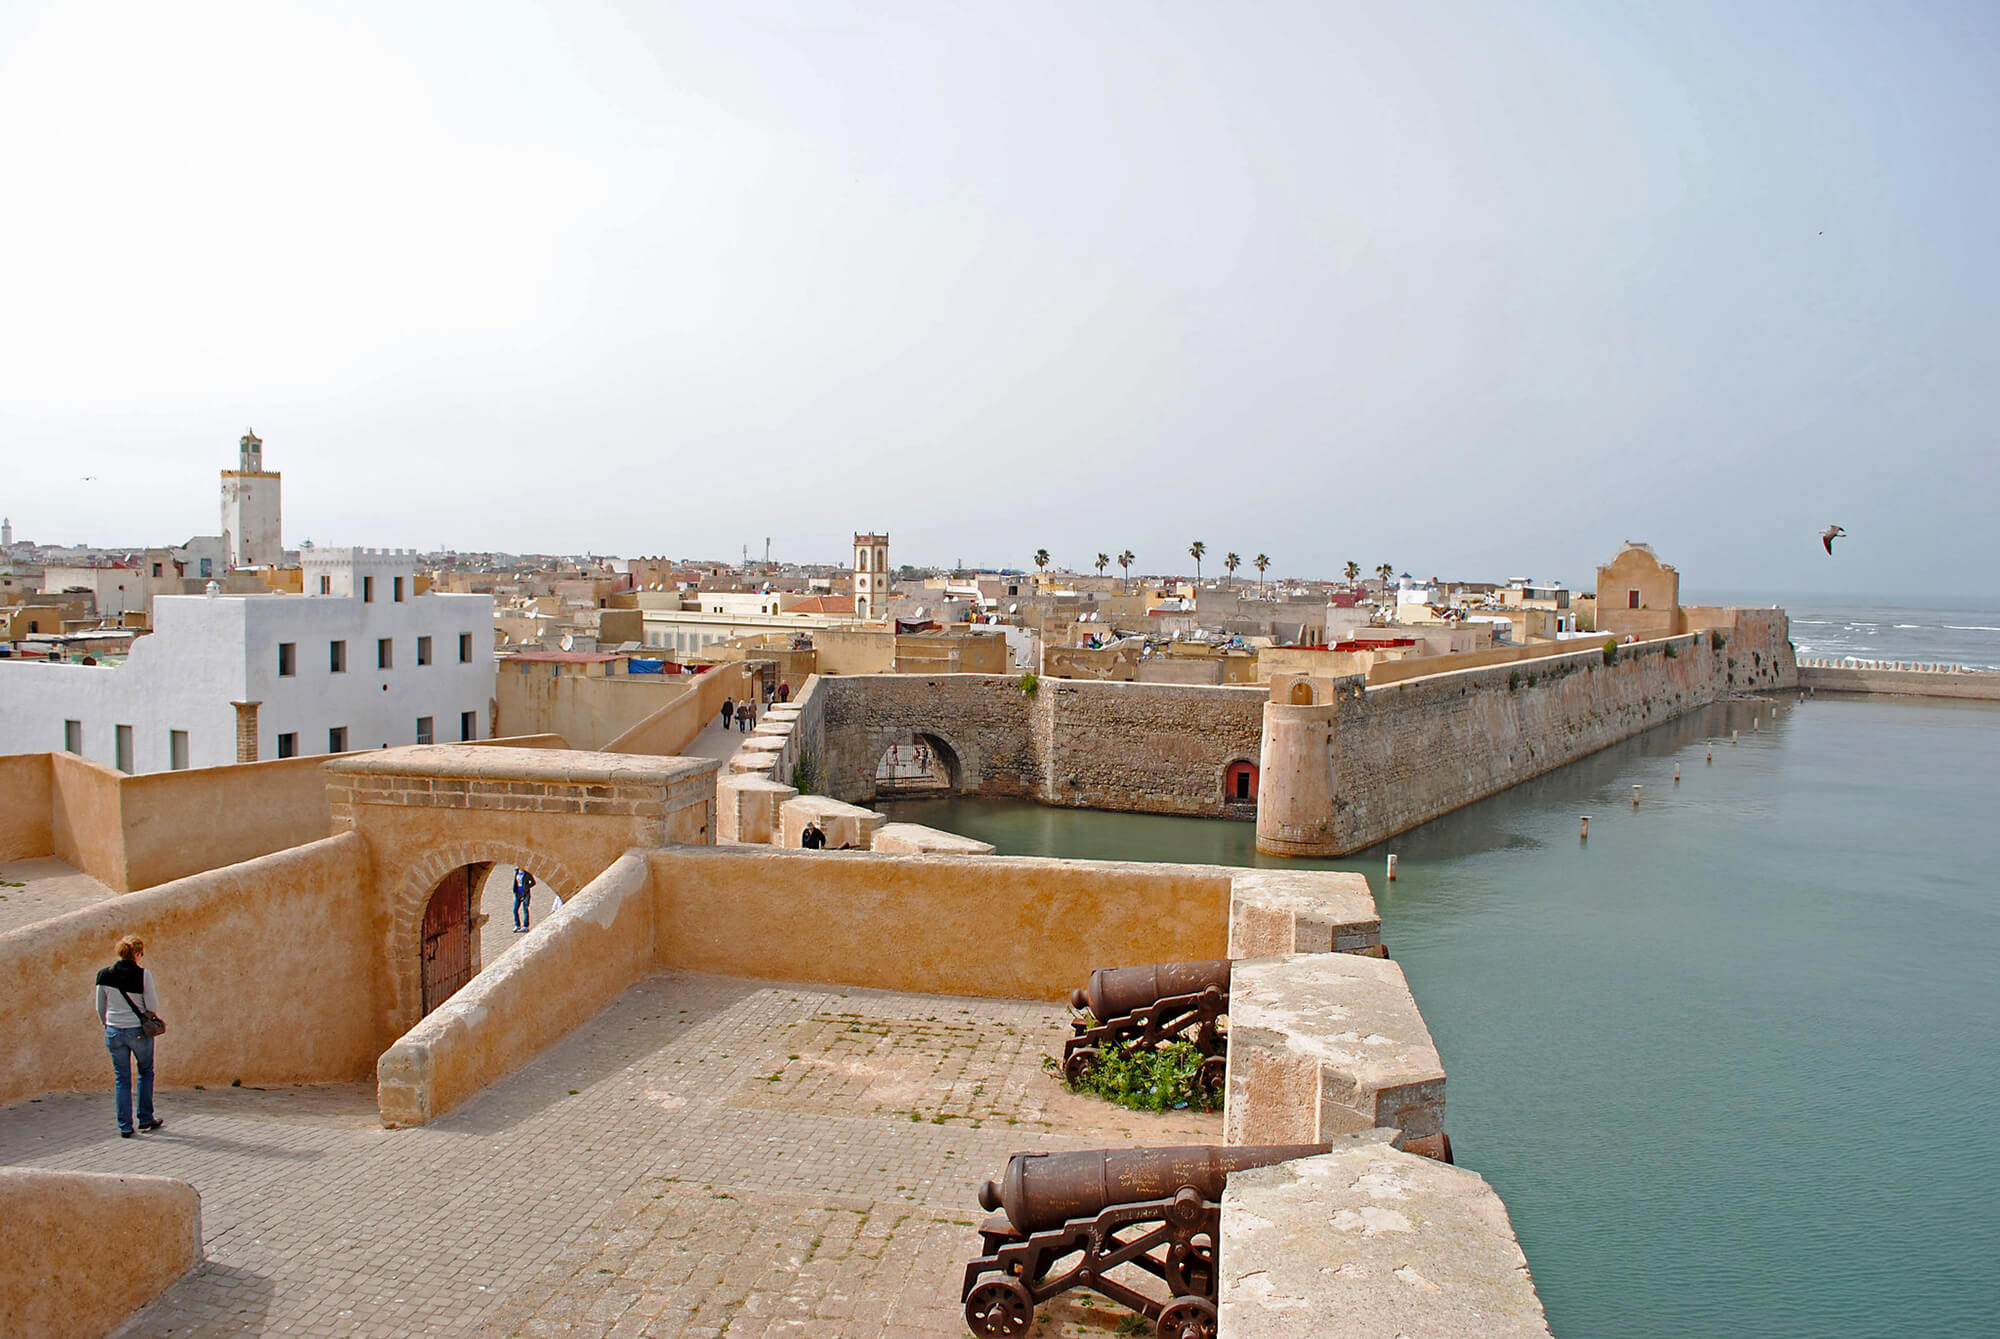 Sahara Desert Tour - Small Moroccan Towns Worth Exploring - El Jadida